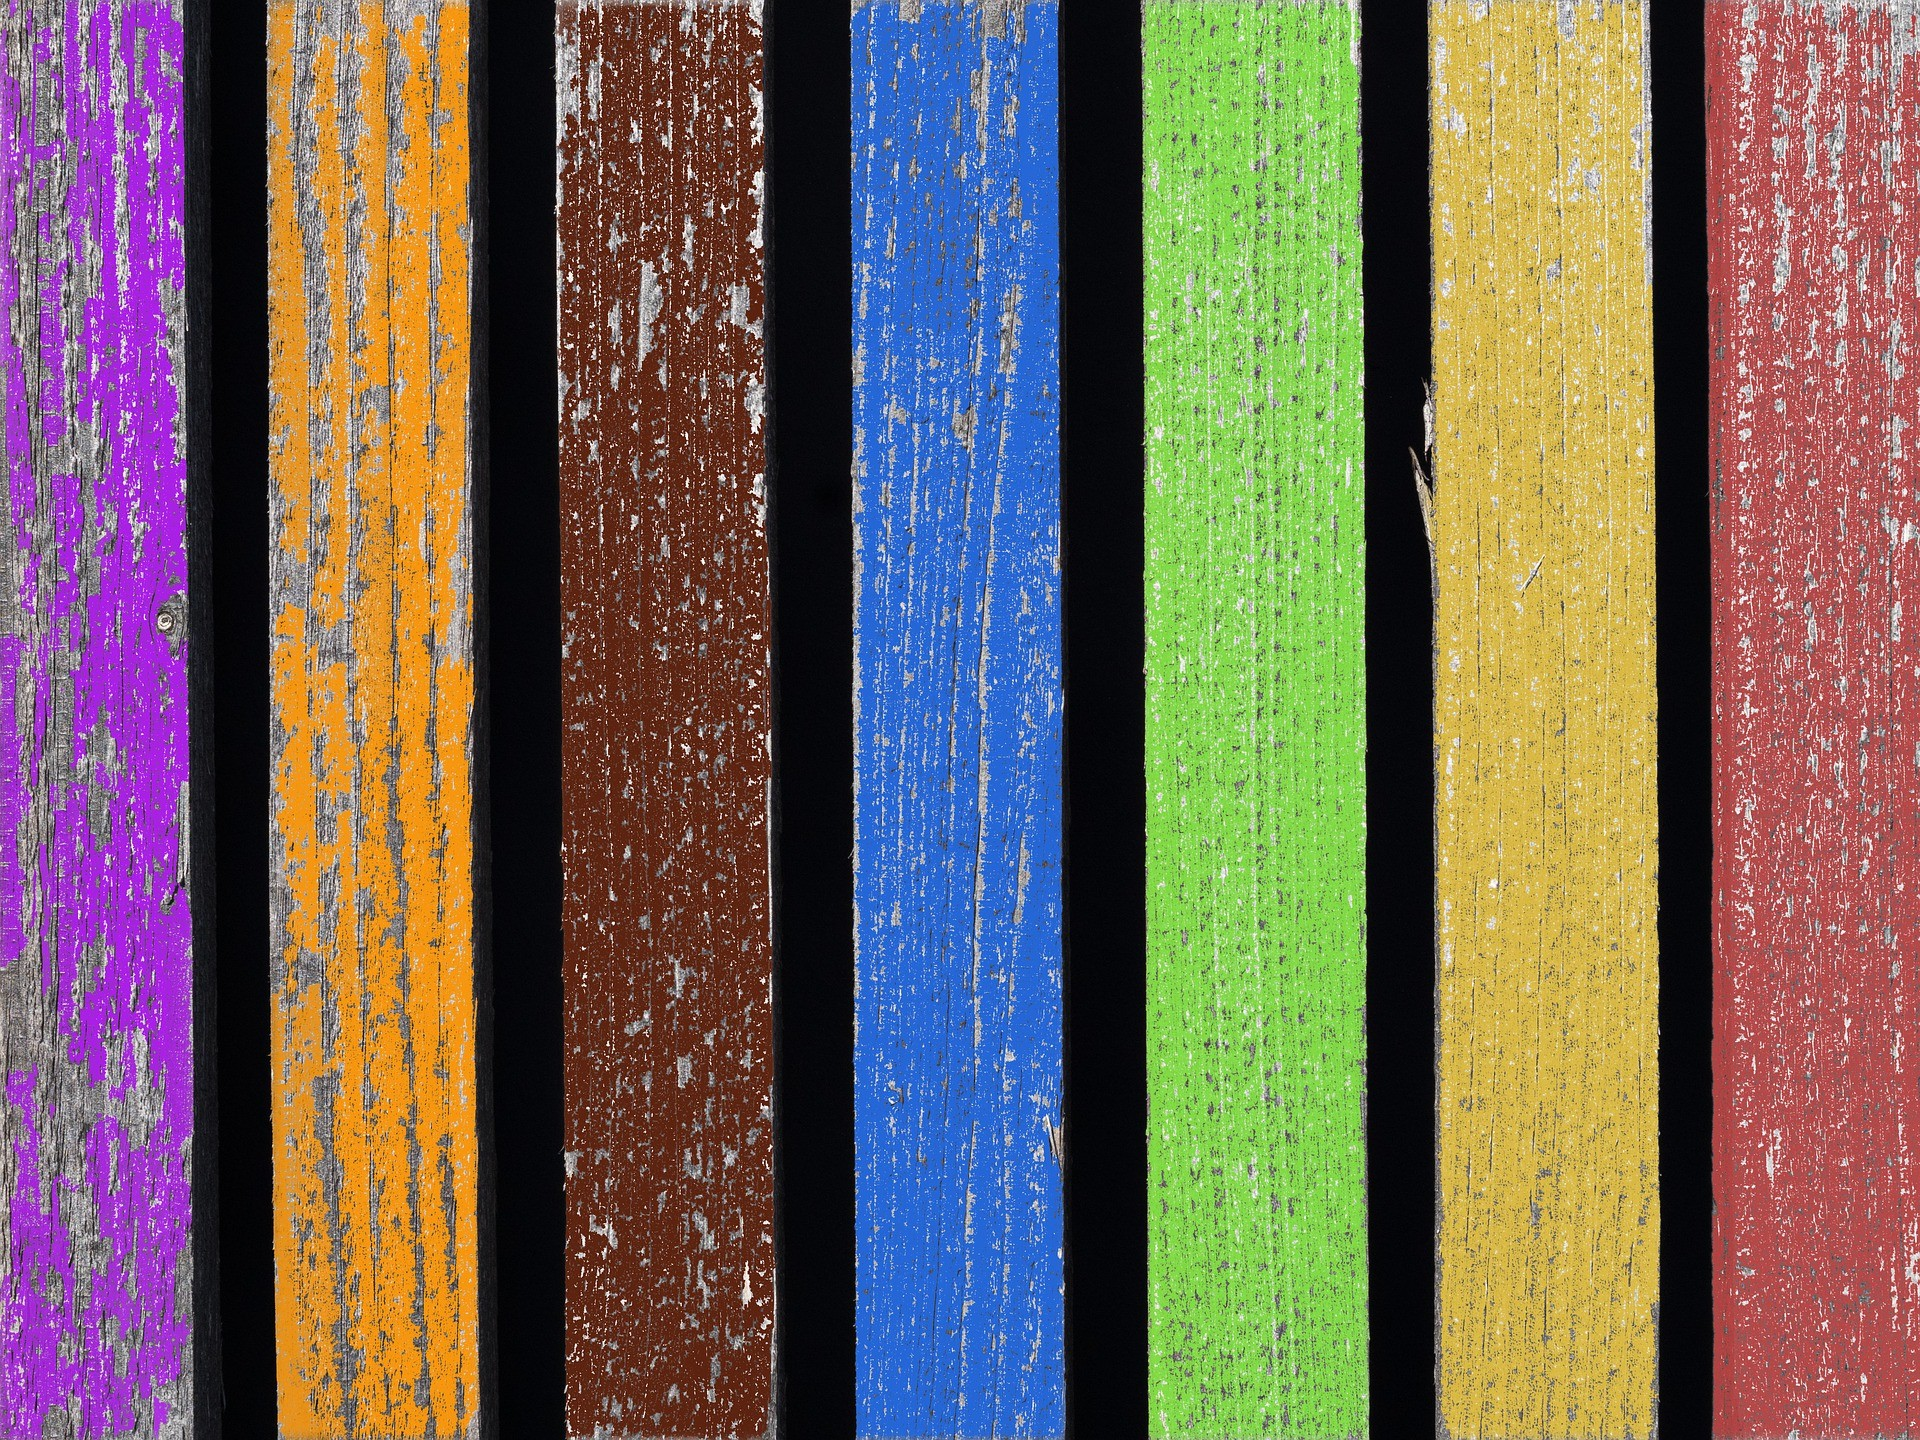 metal railings v wooden fencing